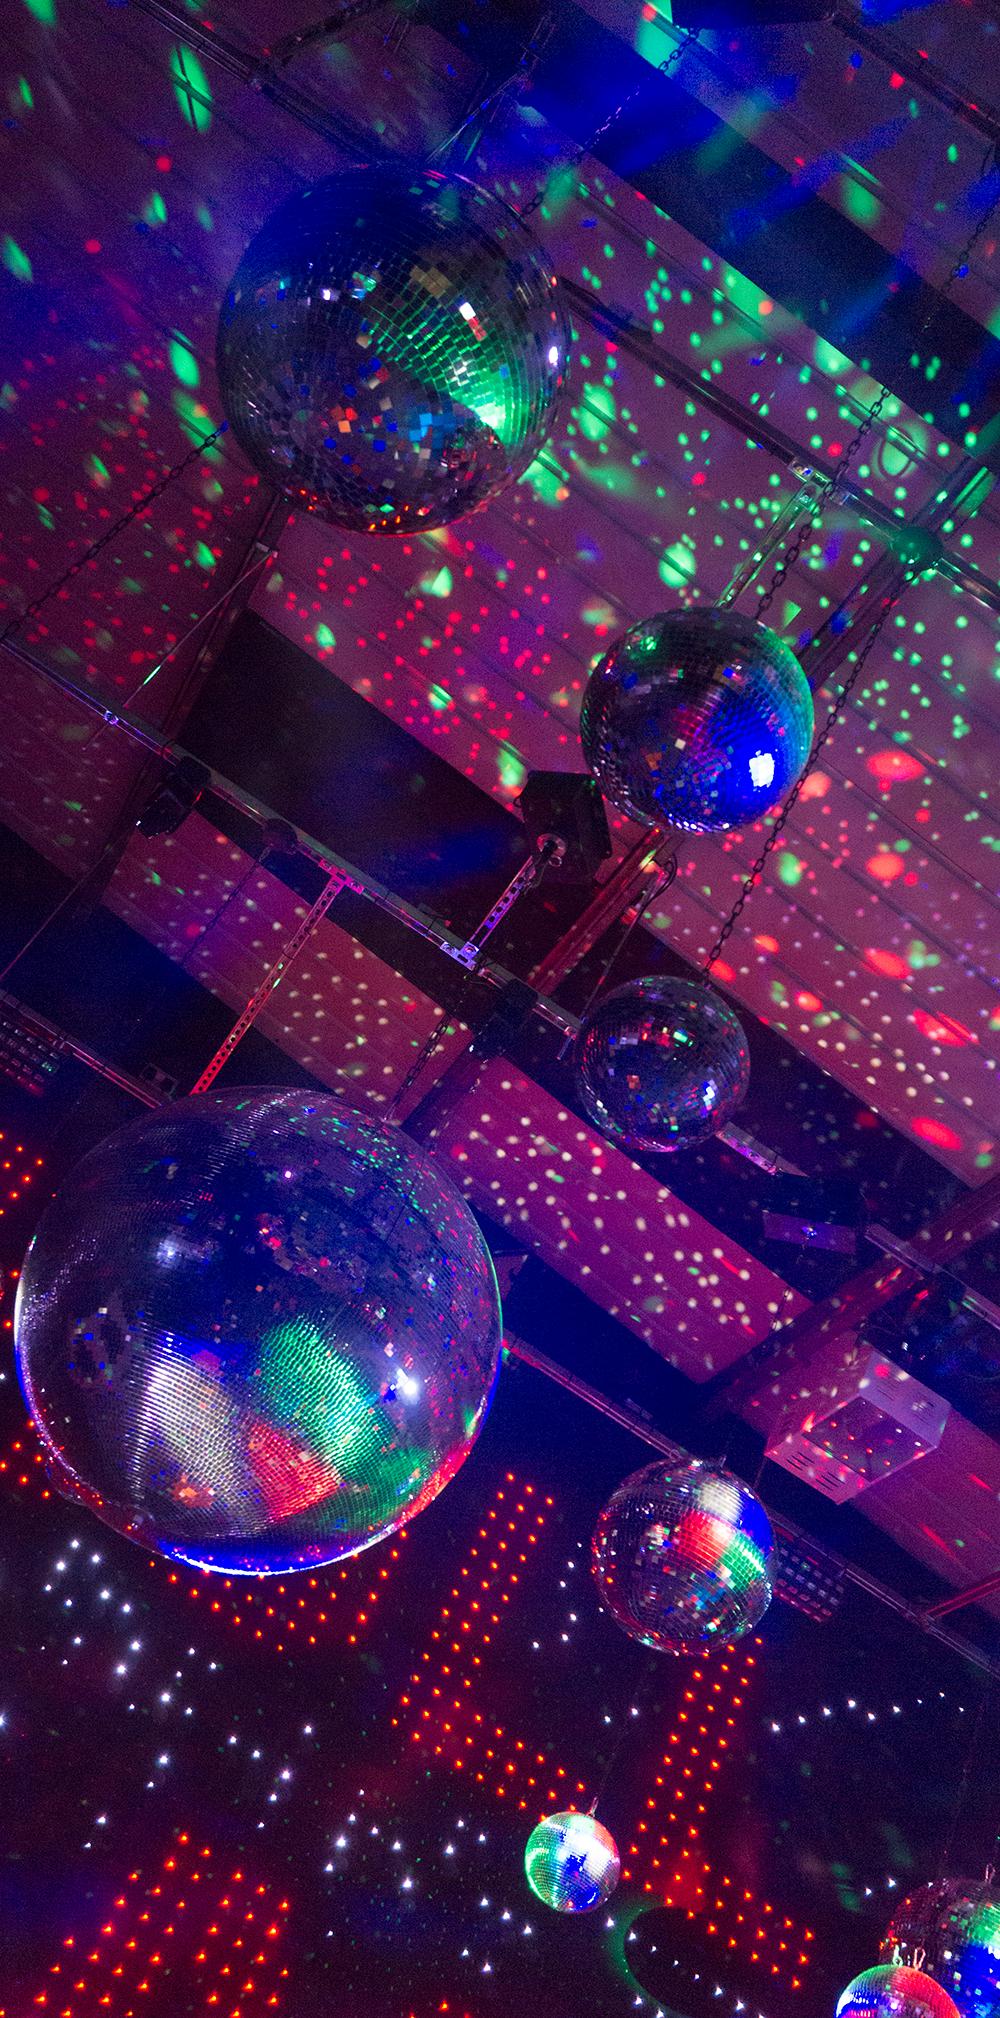 disco-balls-image.png